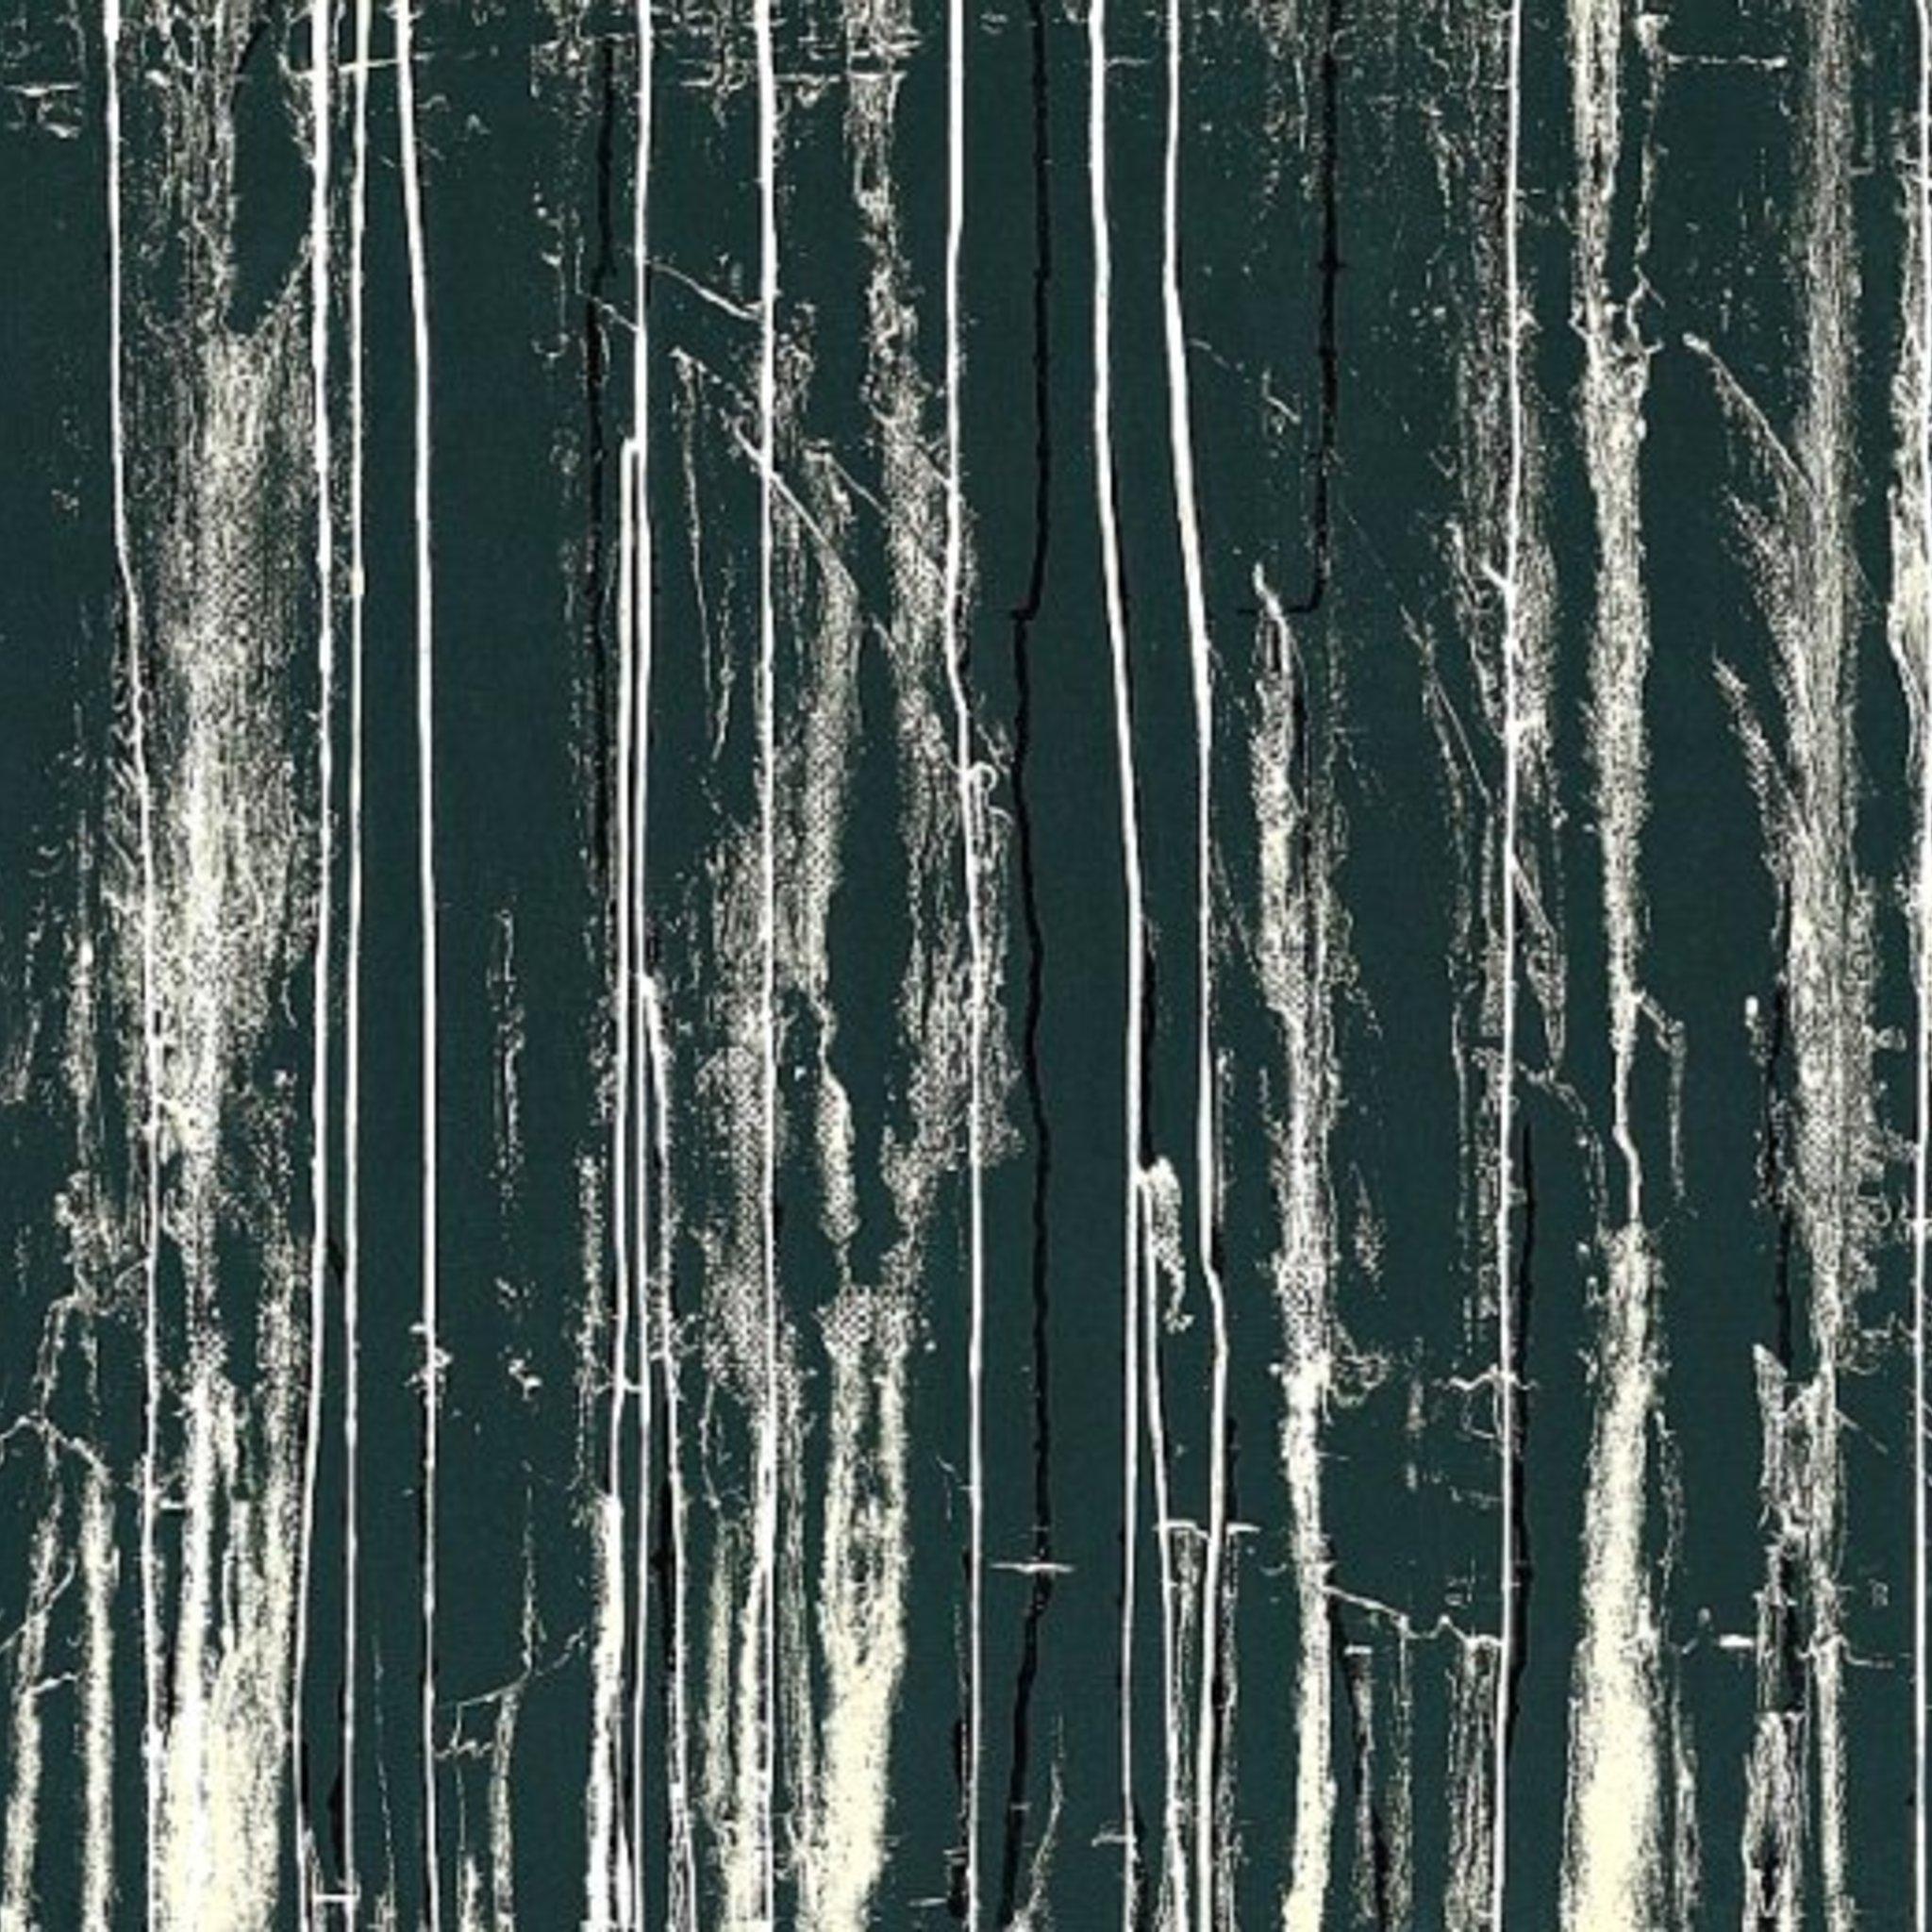 Выставка Яниса Муровскиса «Точка зрения»